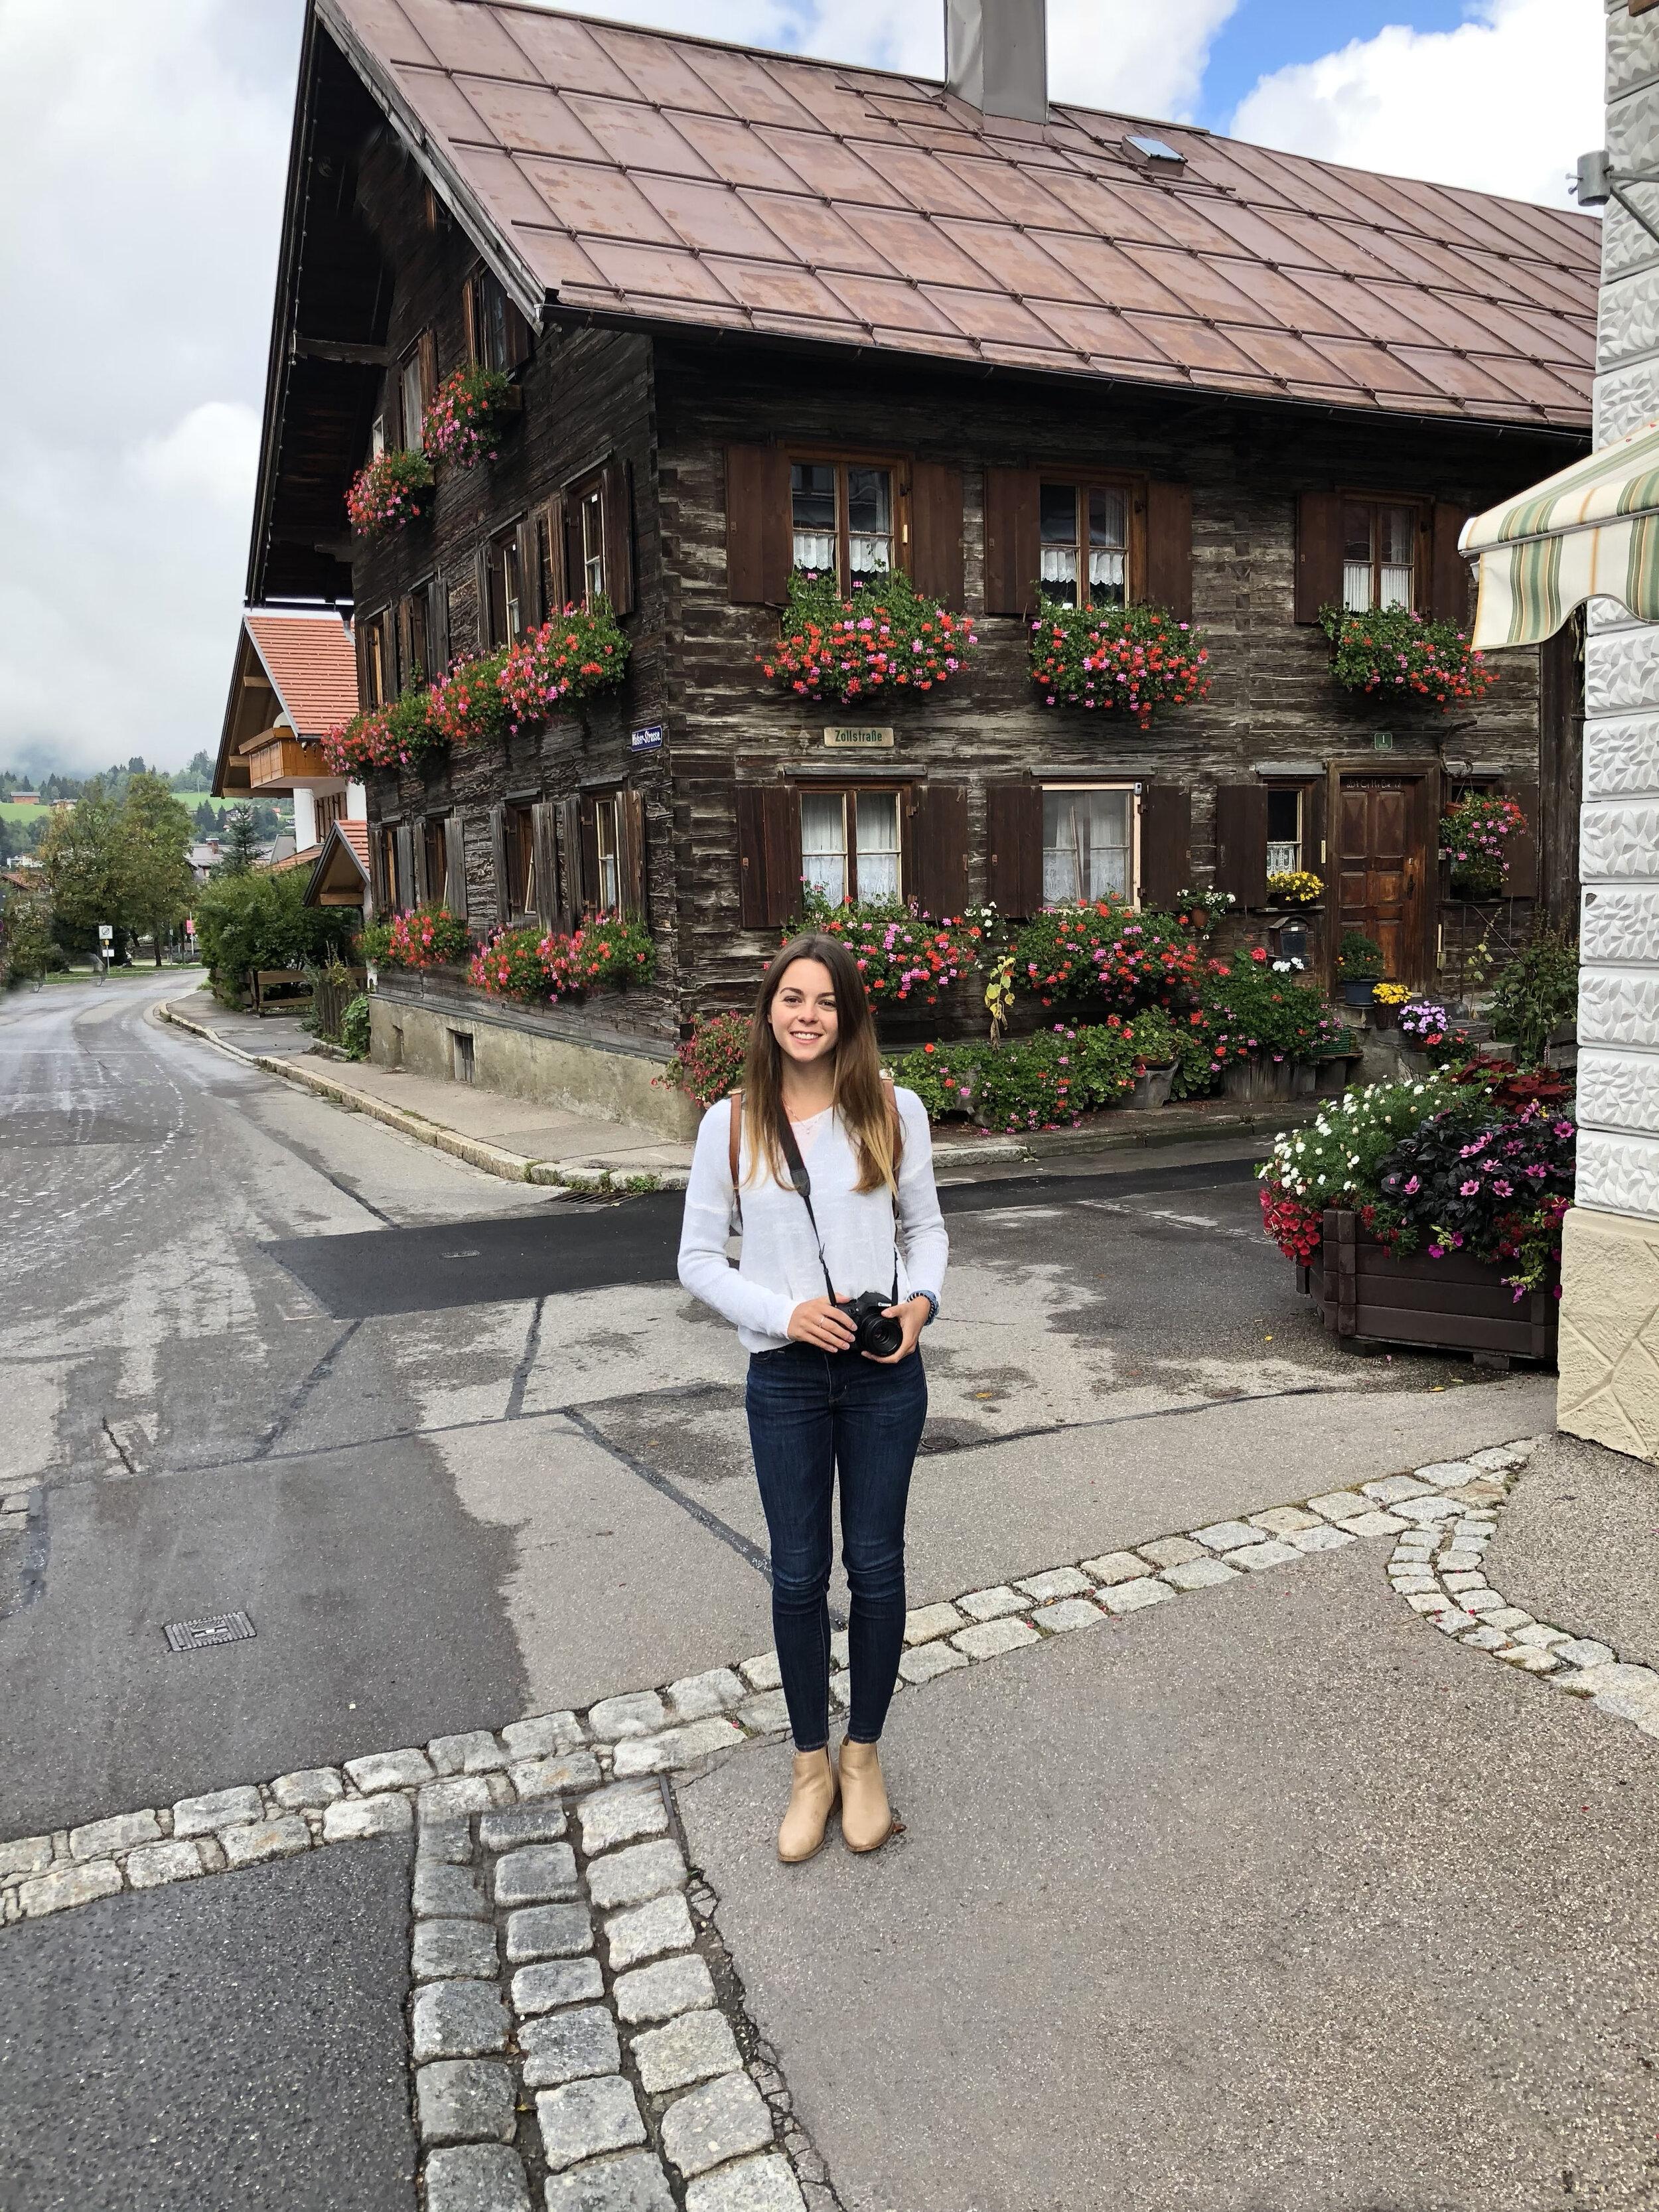 Oberstdorf, Germany September 2018. Visited for the Almabtrieb Festival!